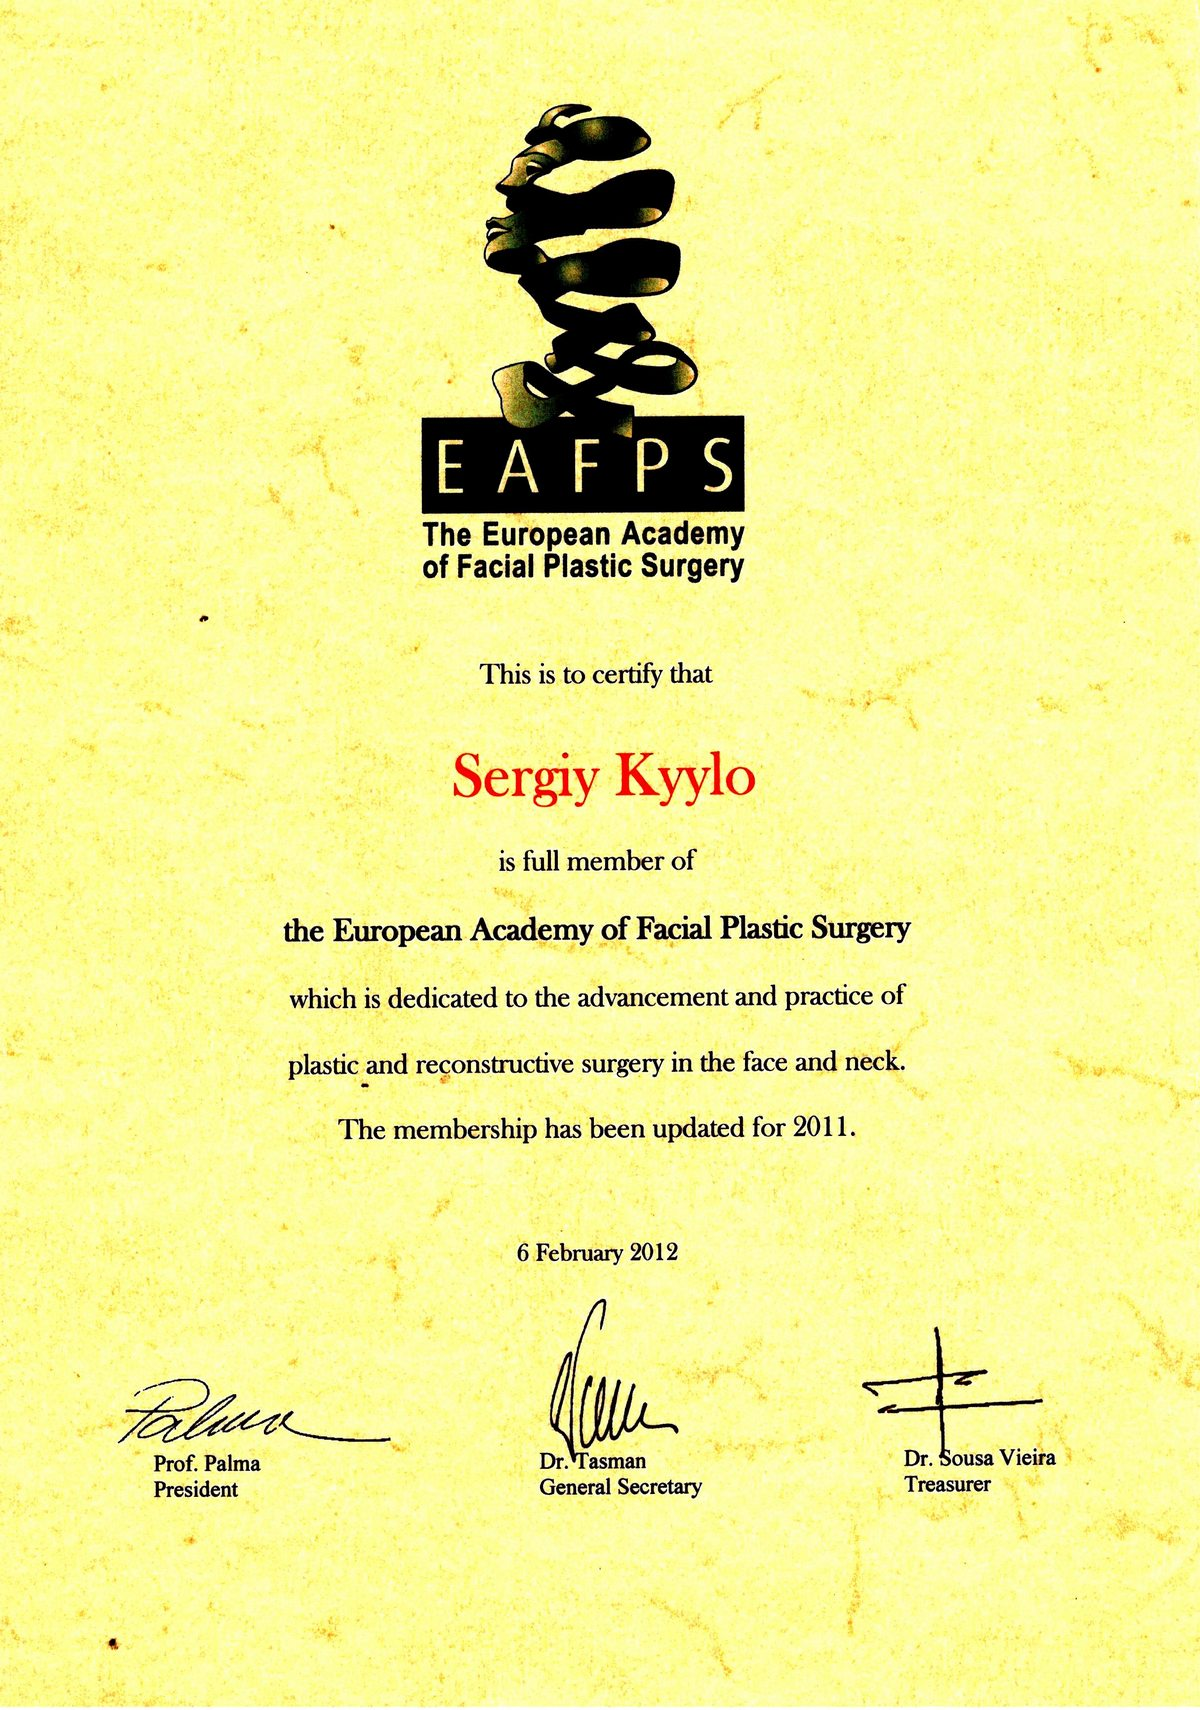 Документ №:6 Сертификат пластического хирурга Кийло Сергея Алексеевича